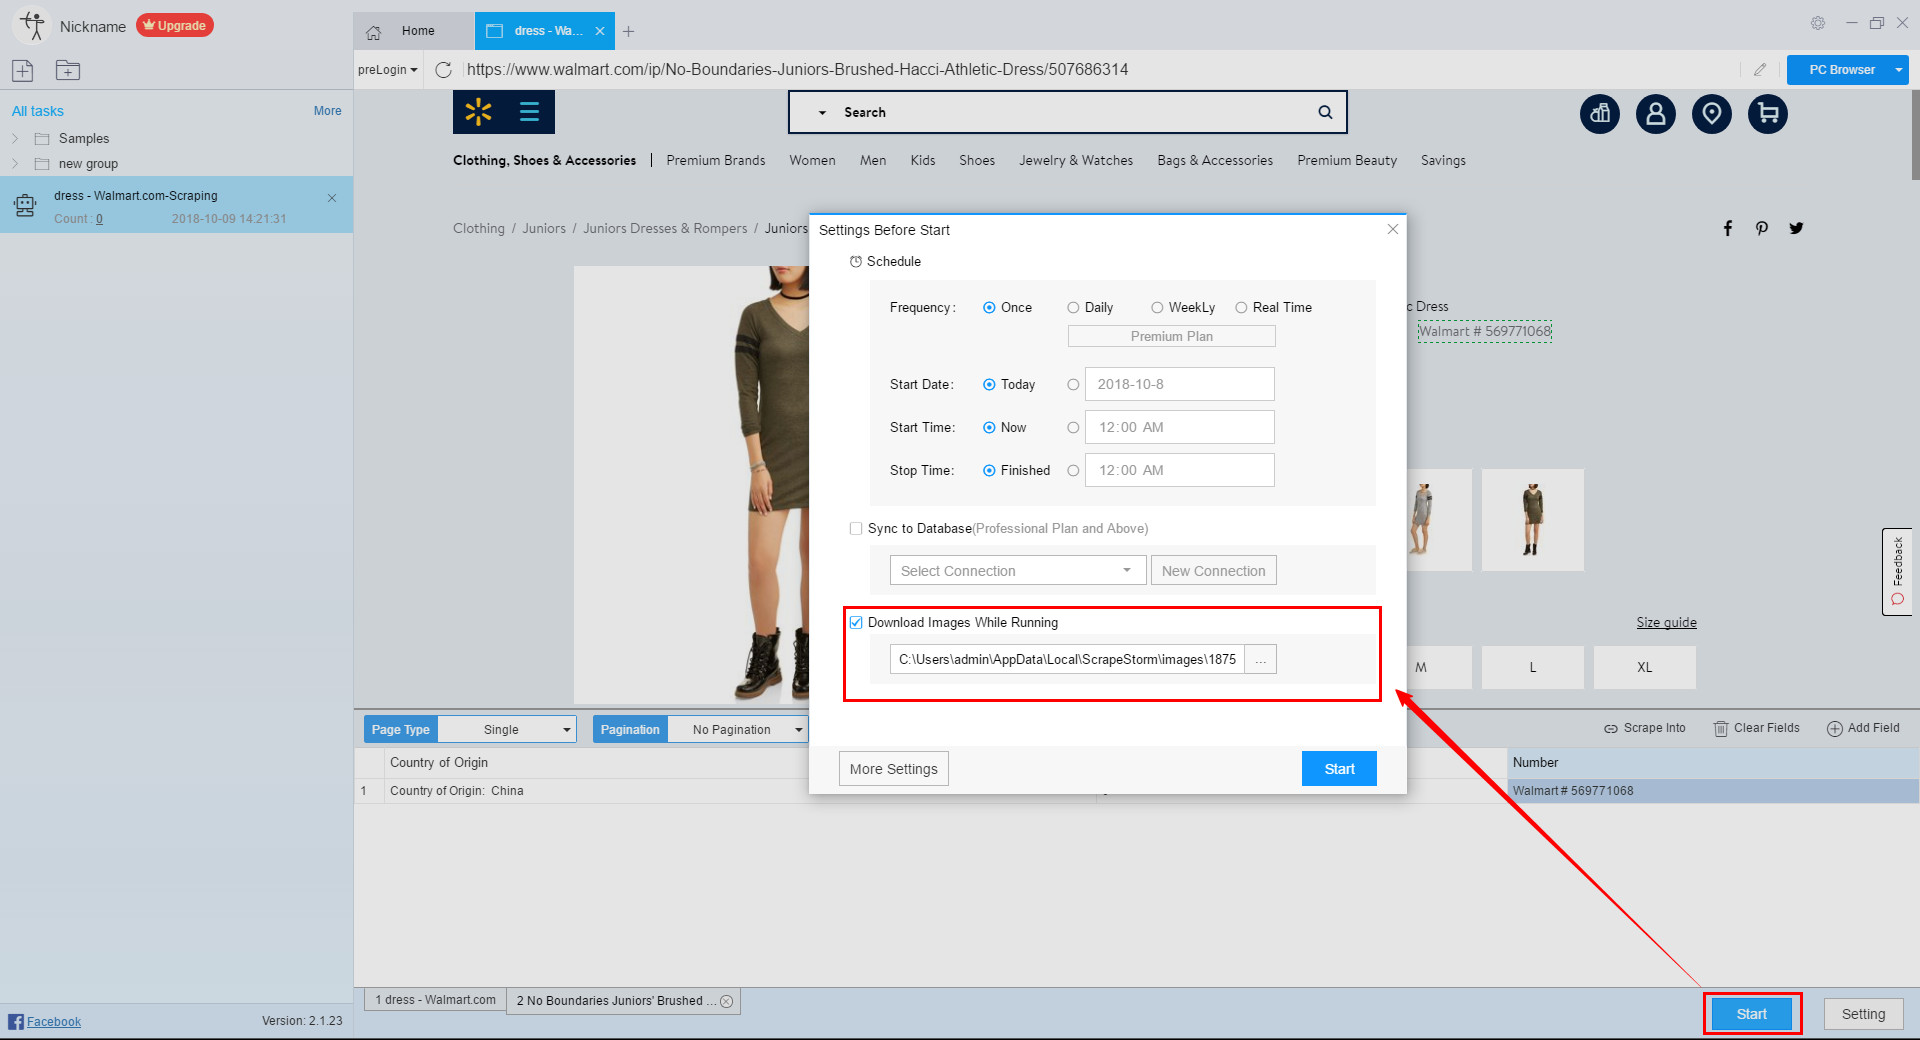 How to Scrape Dress Data from Walmart - Walmart Scraper